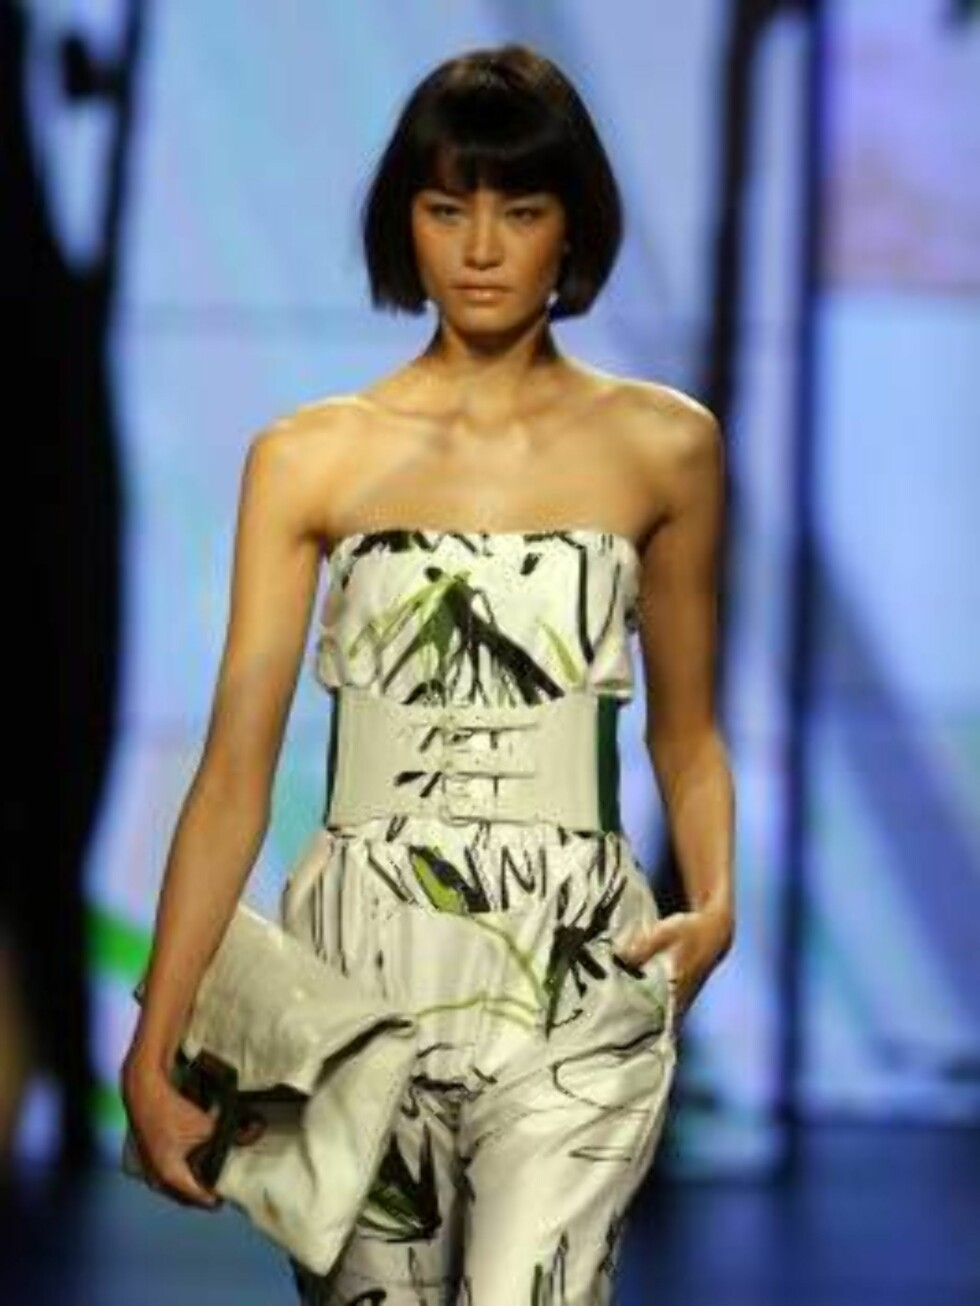 A model wears a Osklen design during the Sao Paulo Fashion Week in Sao Paulo, Brazil, on Friday, July 14, 2006. (AP Photo/Andre Penner) Foto: AP/Scanpix